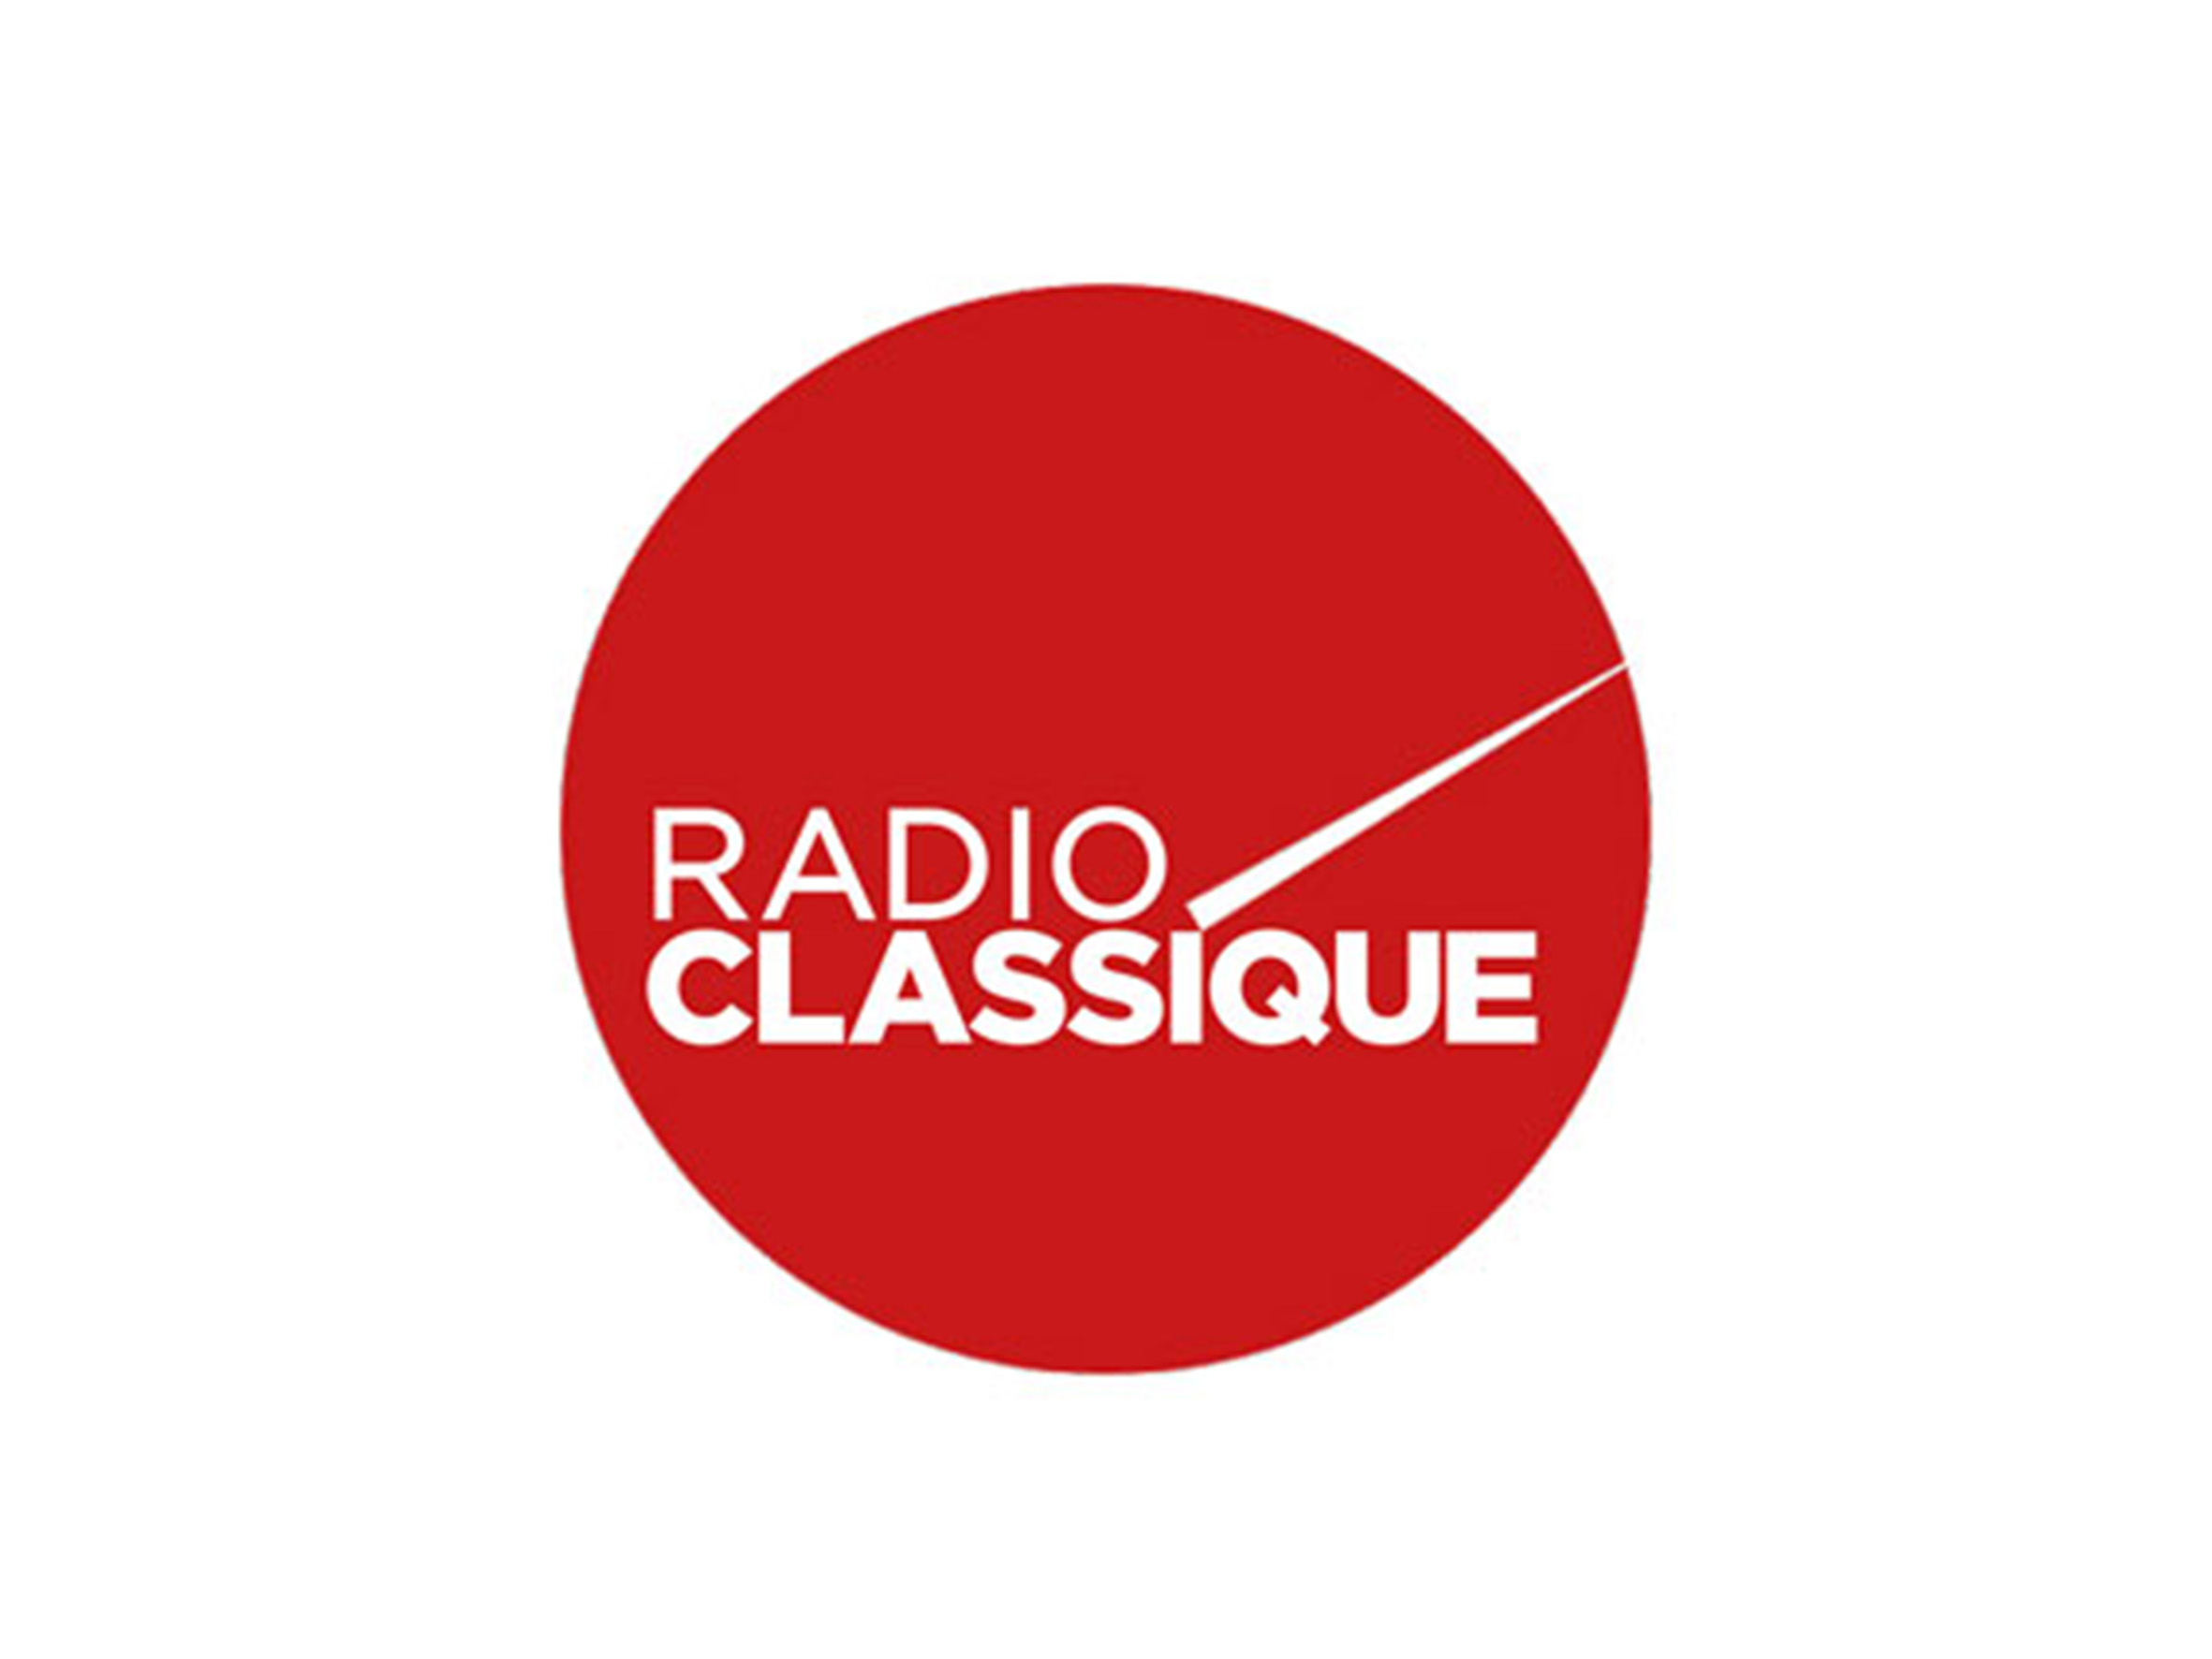 Logo Radio Classique - Médias - Jérôme Adam - Conférencier Entrepreneur